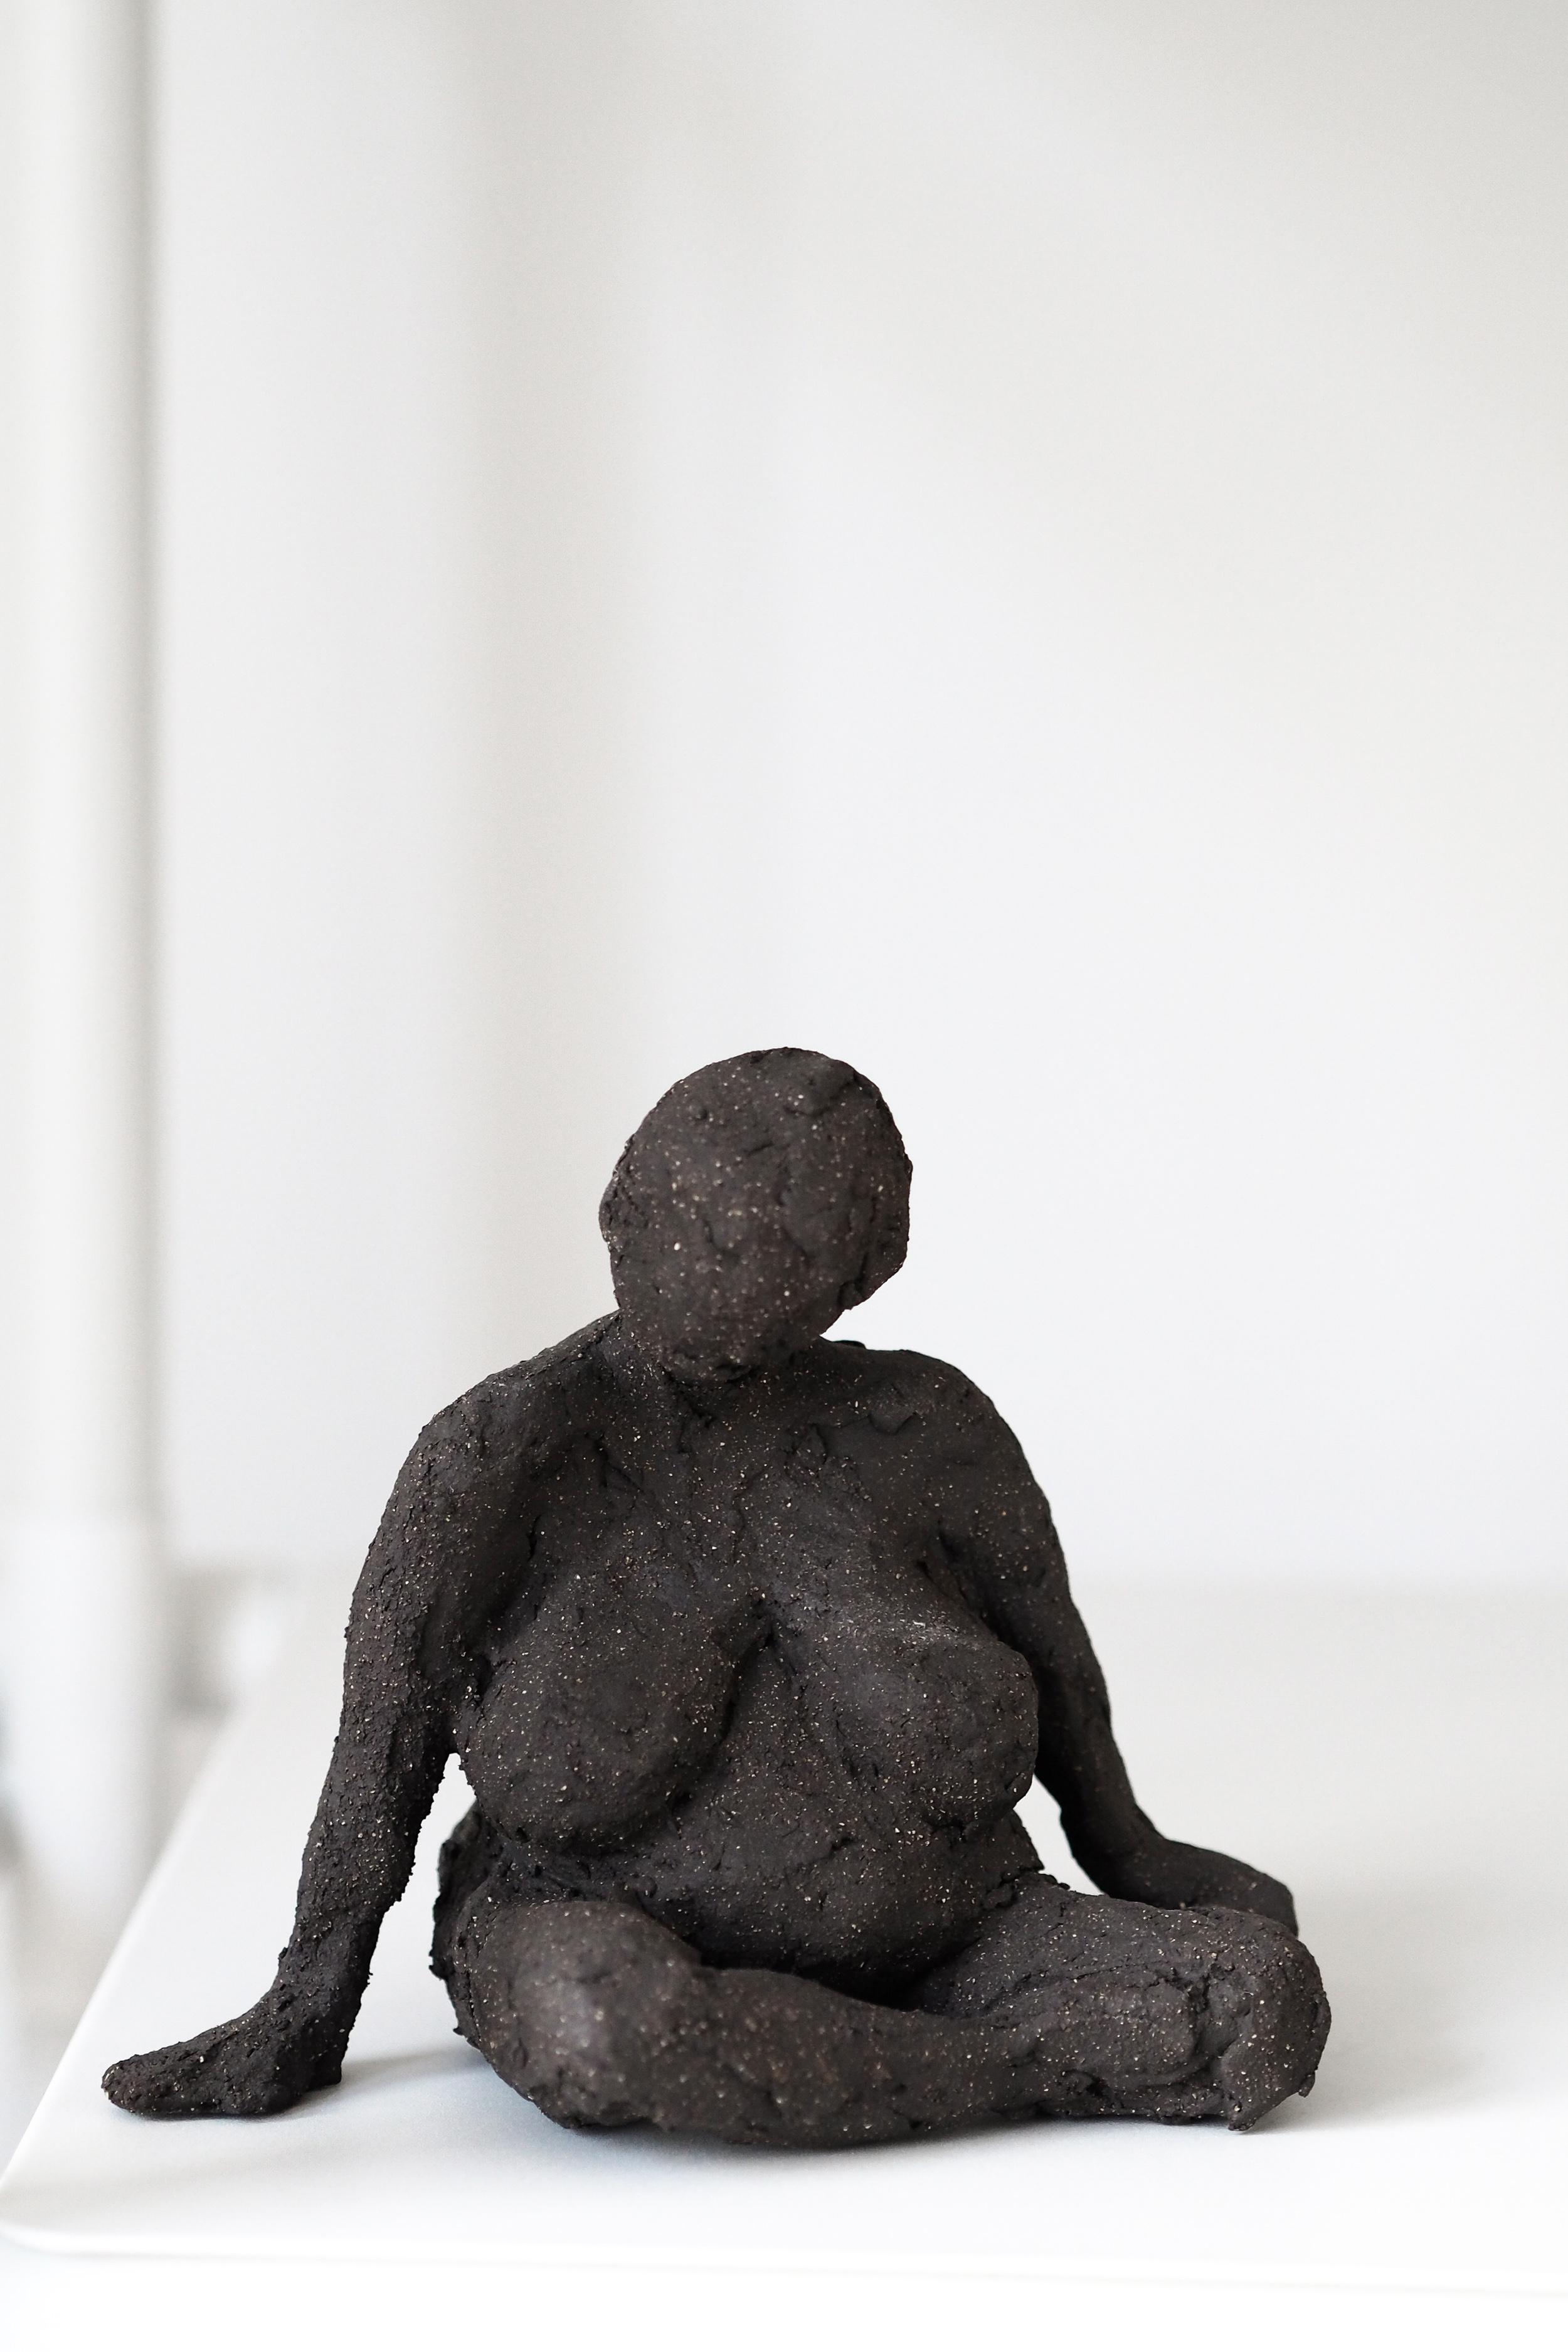 Expanding my creativity, sculpting life models (no. 1)